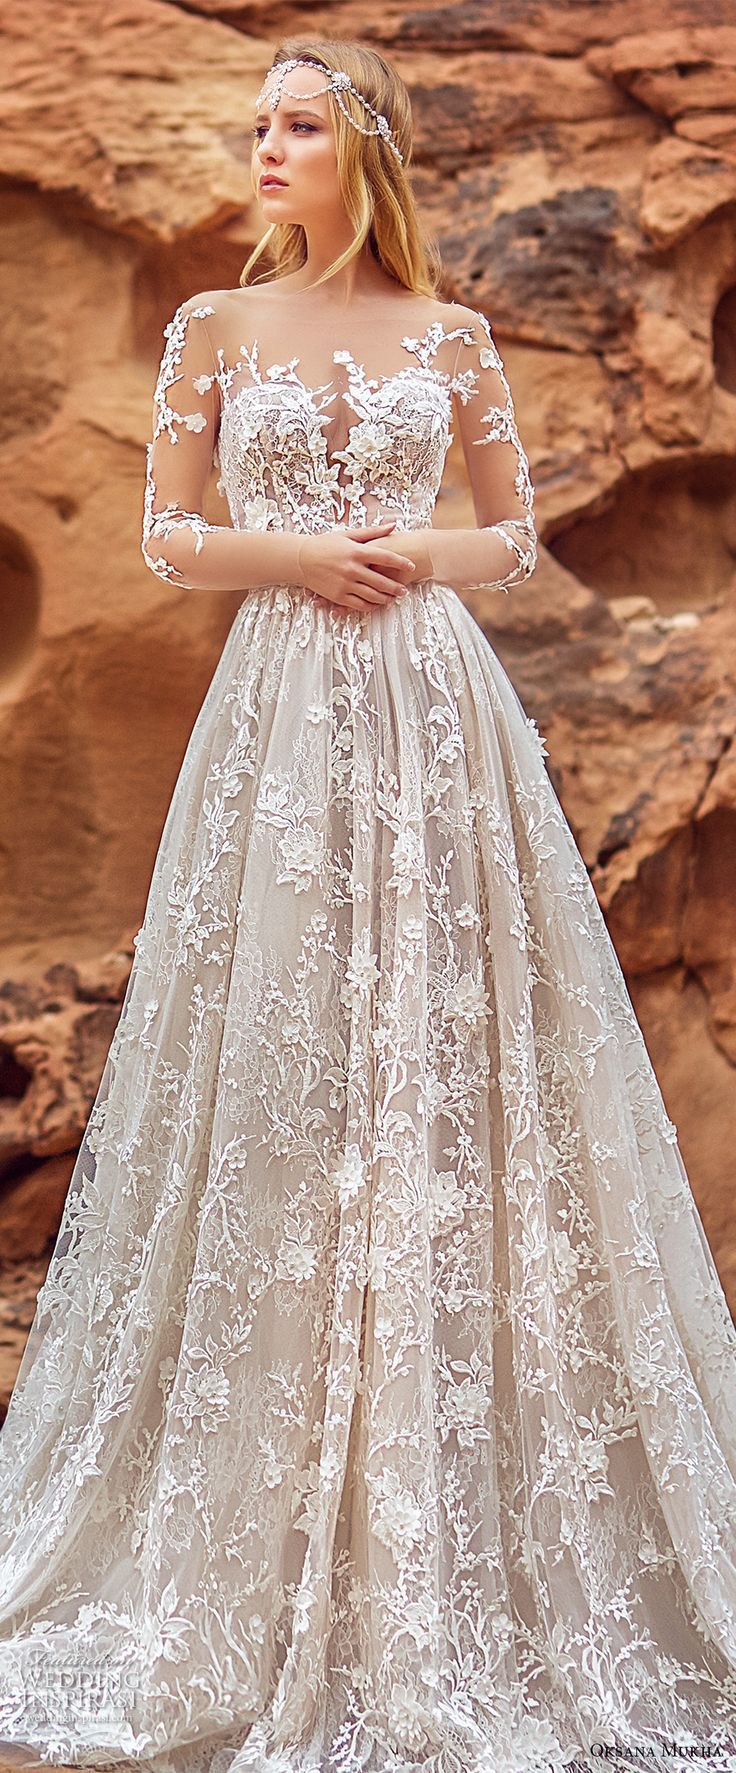 Oksana Mukha 2018 Wedding Dresses Wedding Inspirasi Wedding Dresses A Line Wedding Dress Wedding Dresses Lace [ 1773 x 736 Pixel ]